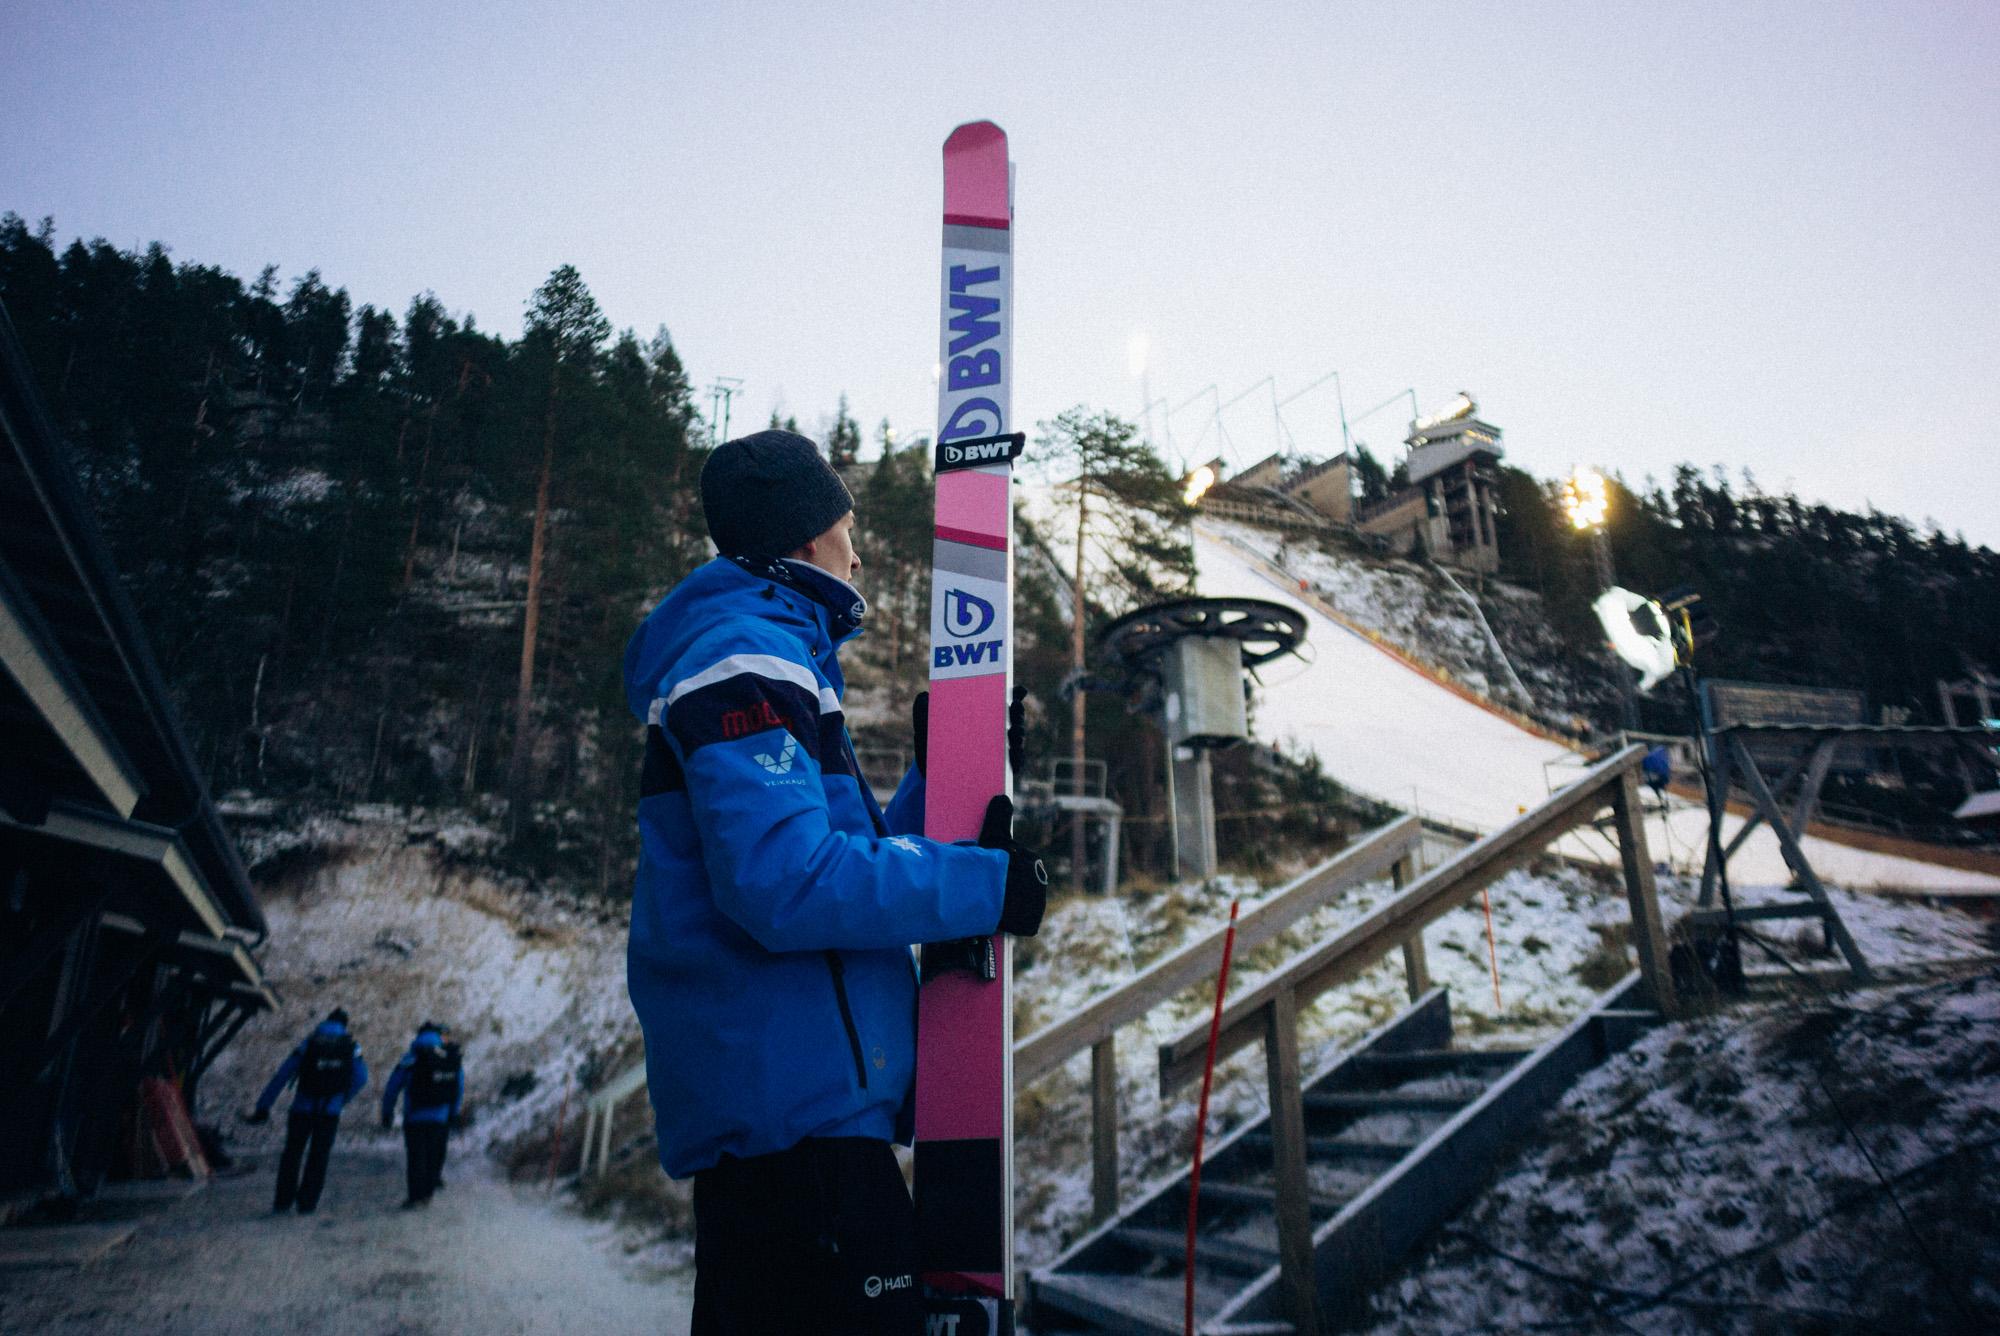 greta-horsch_bwt_ski-jumping_max-threlfall_16